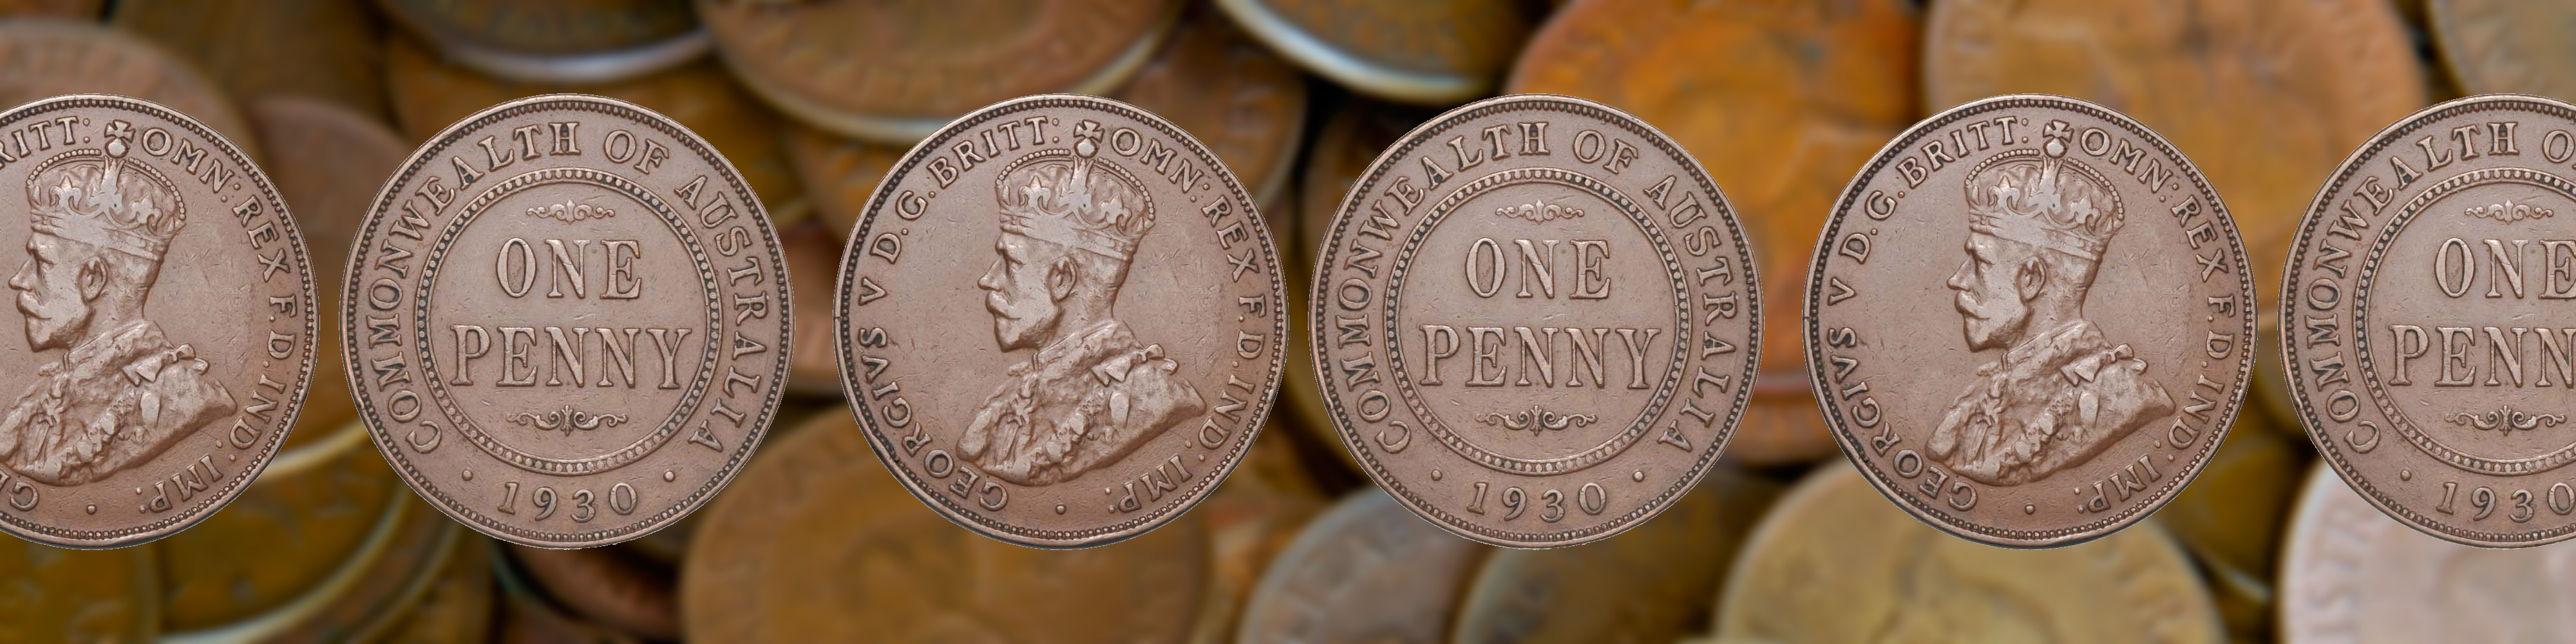 The Famous Australian 1930 Penny - Australia Post